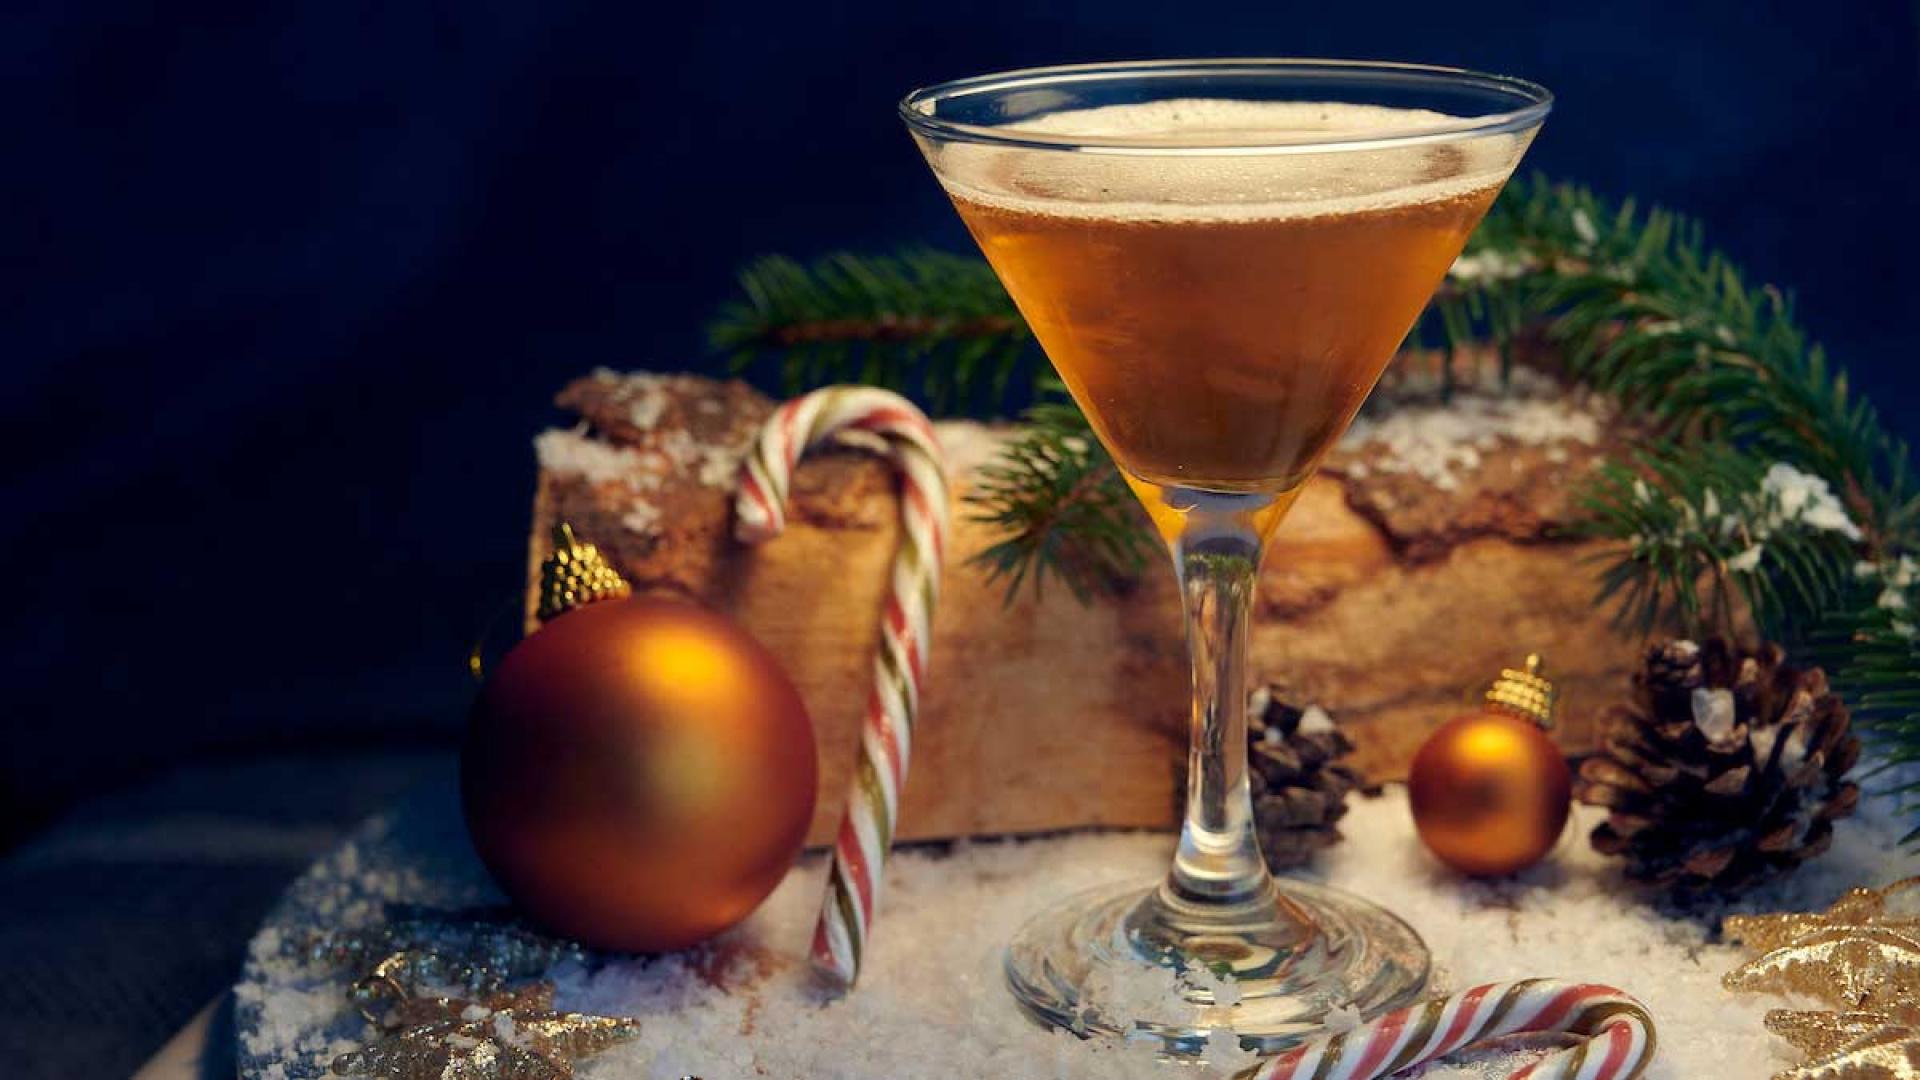 The Christmas stocking cocktail, using Bardinet brandy